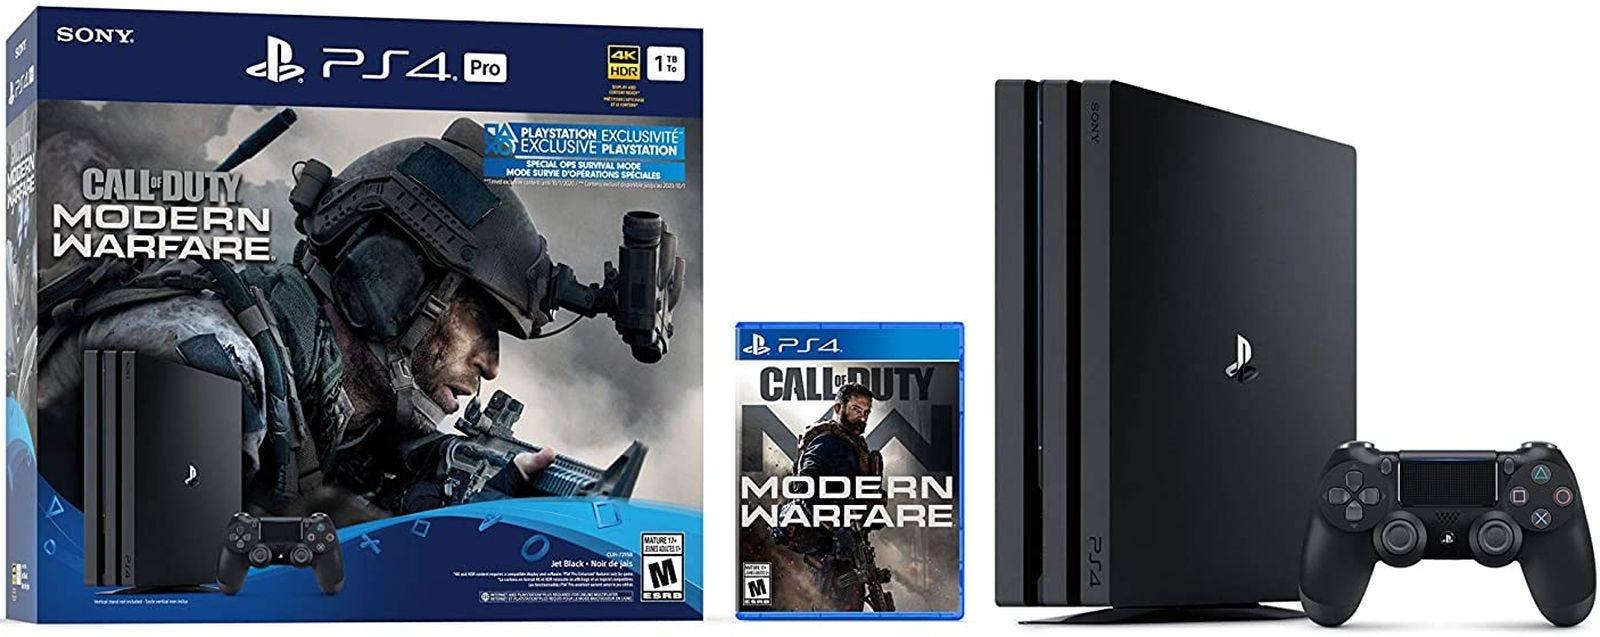 PS4 pro 1tb call of duty bundle